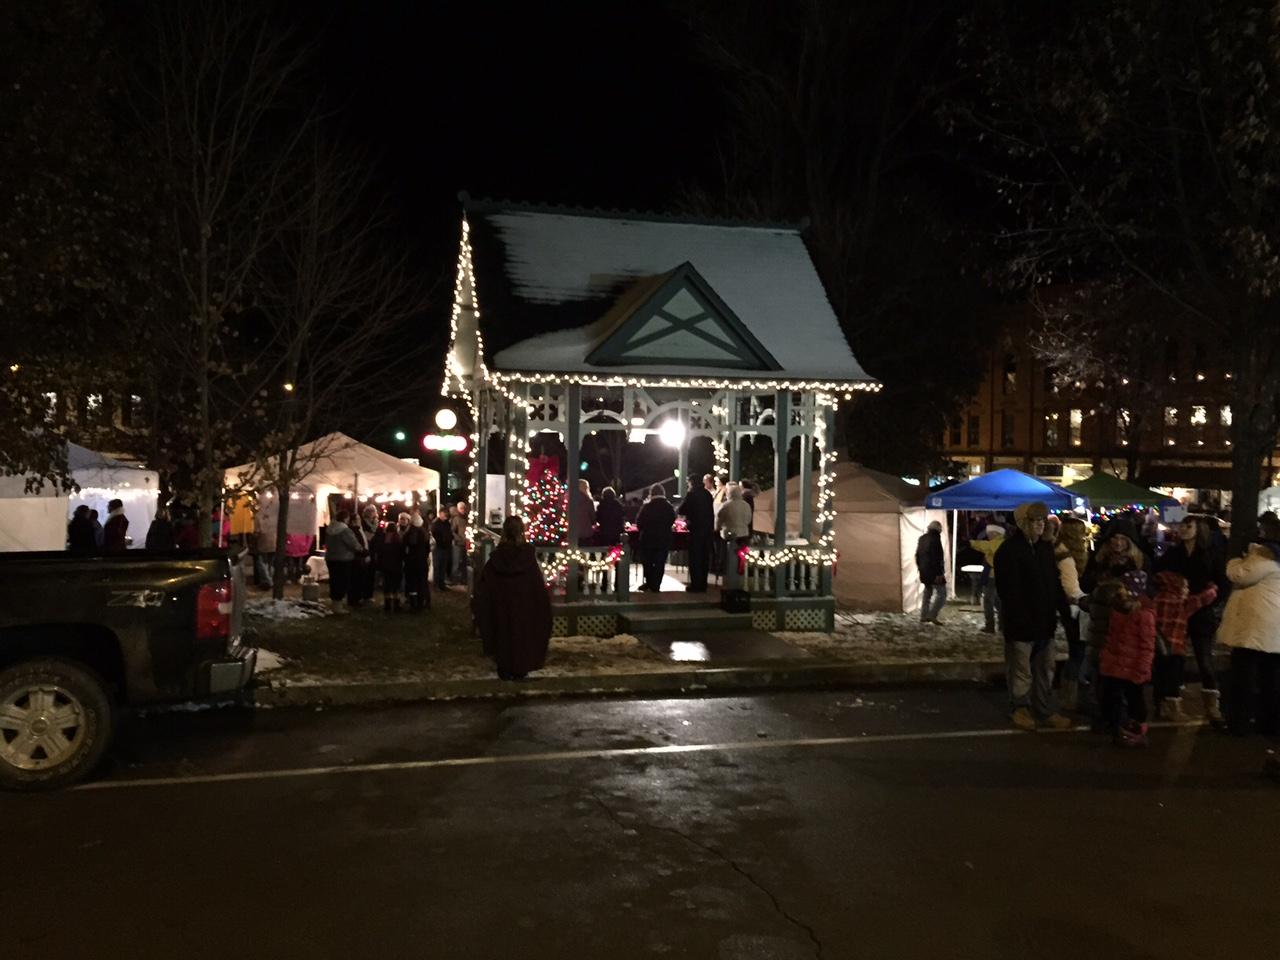 Christmas In The Park.Christmas In The Park Hammondsport Chamber Of Commerce